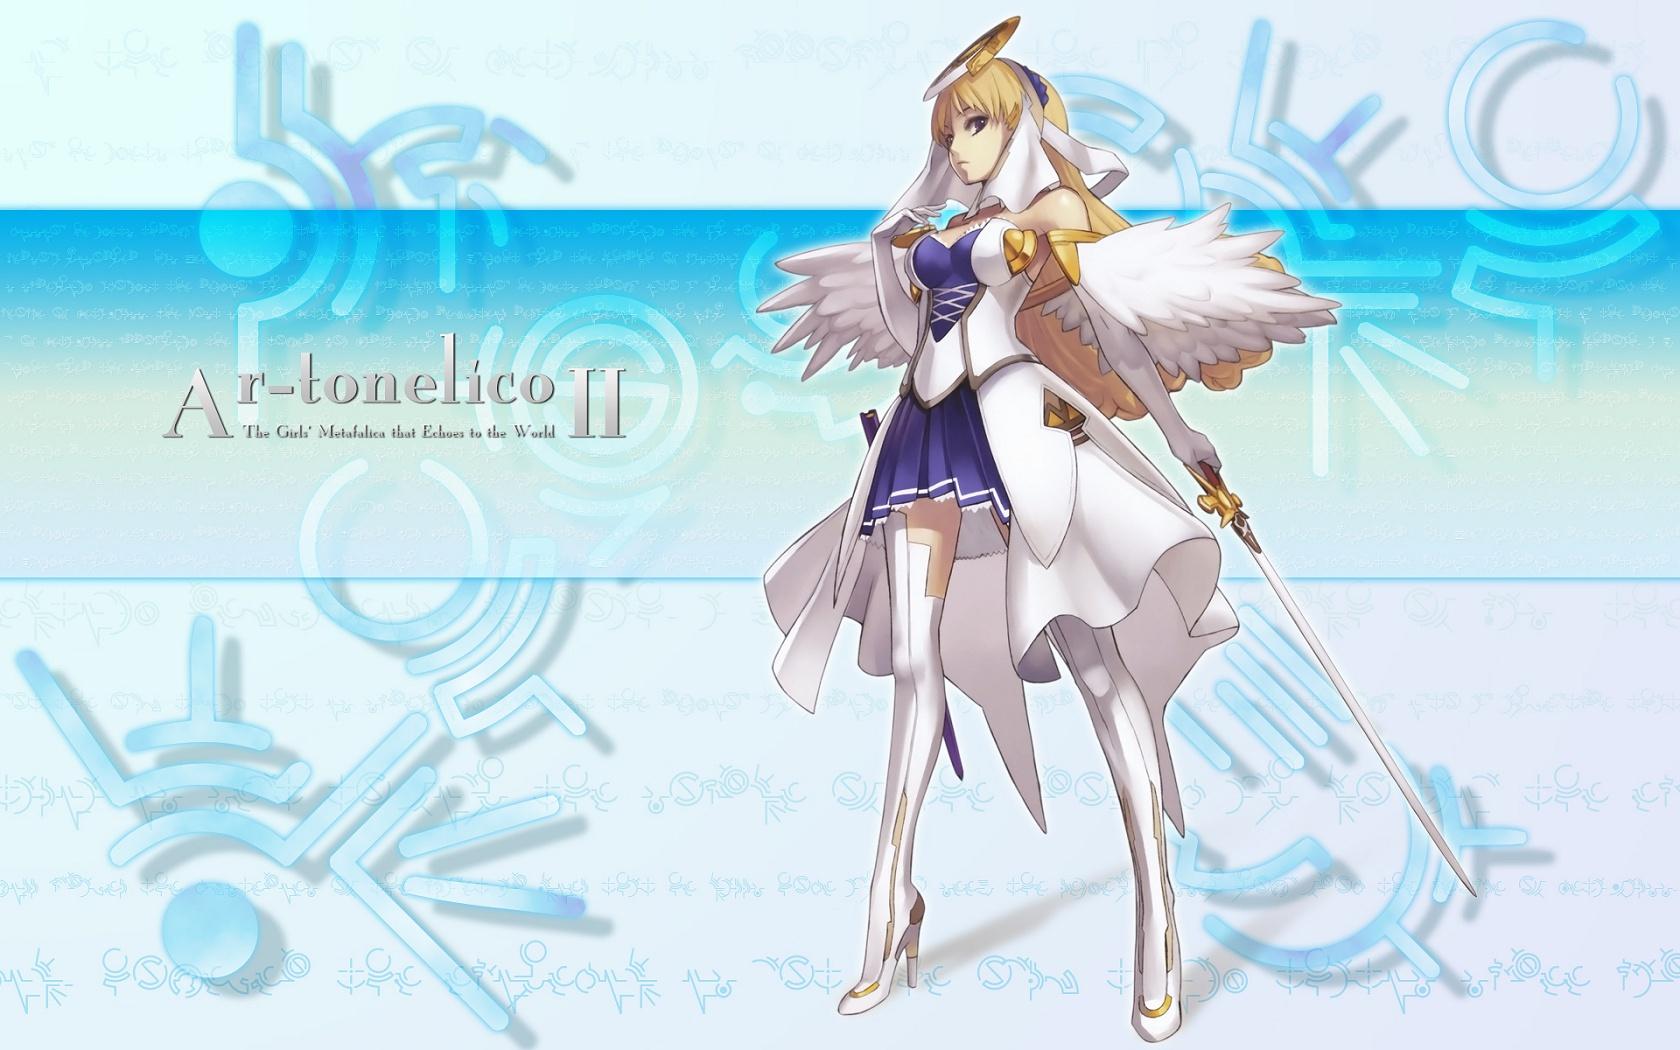 ar_tonelico ar_tonelico_ii cloche_leythal_pastalia nagi_ryou sword thighhighs weapon